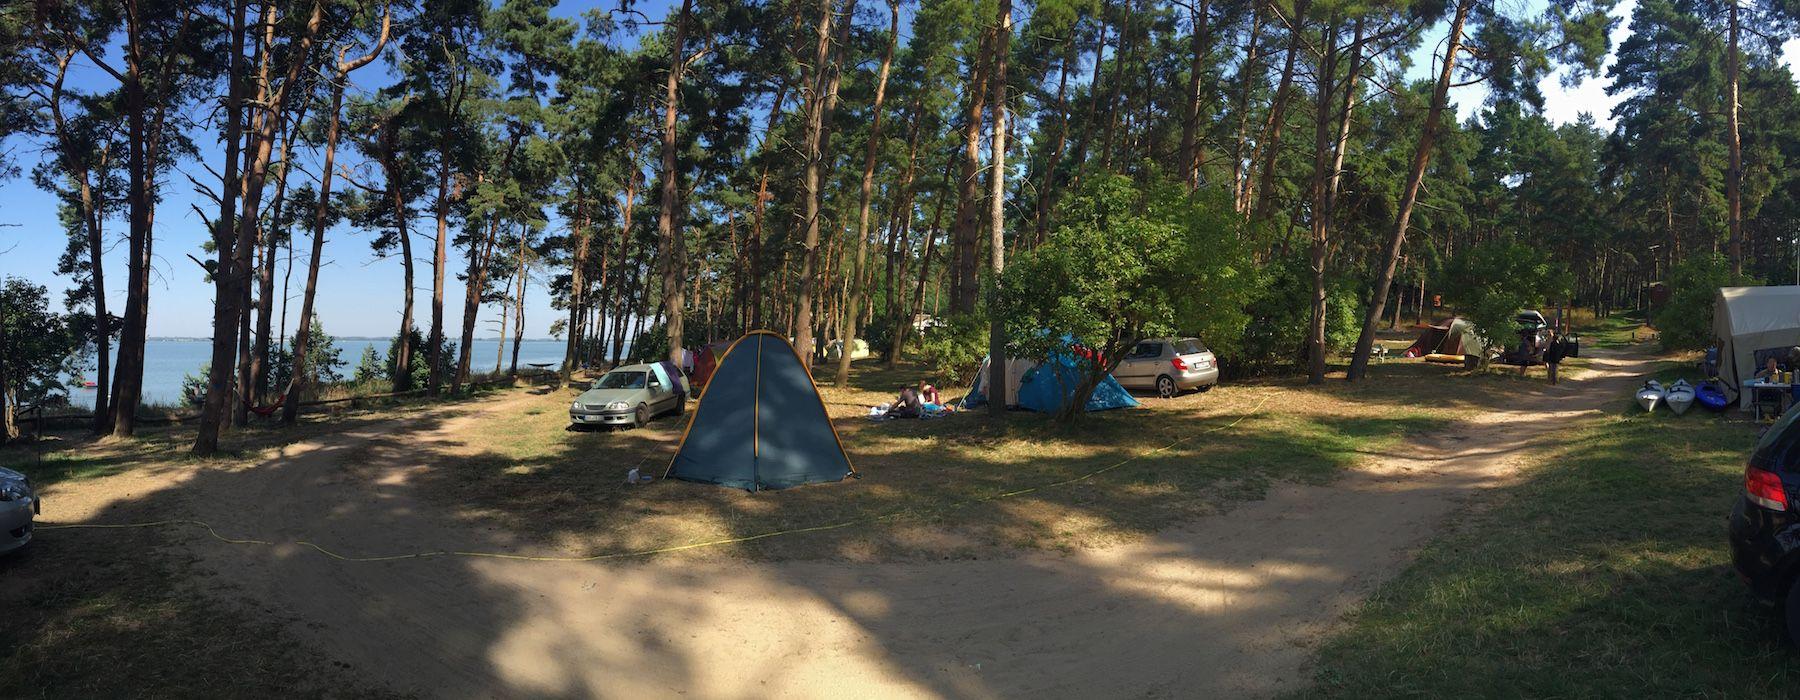 NaturCampingUsedom Der Campingplatz direkt am